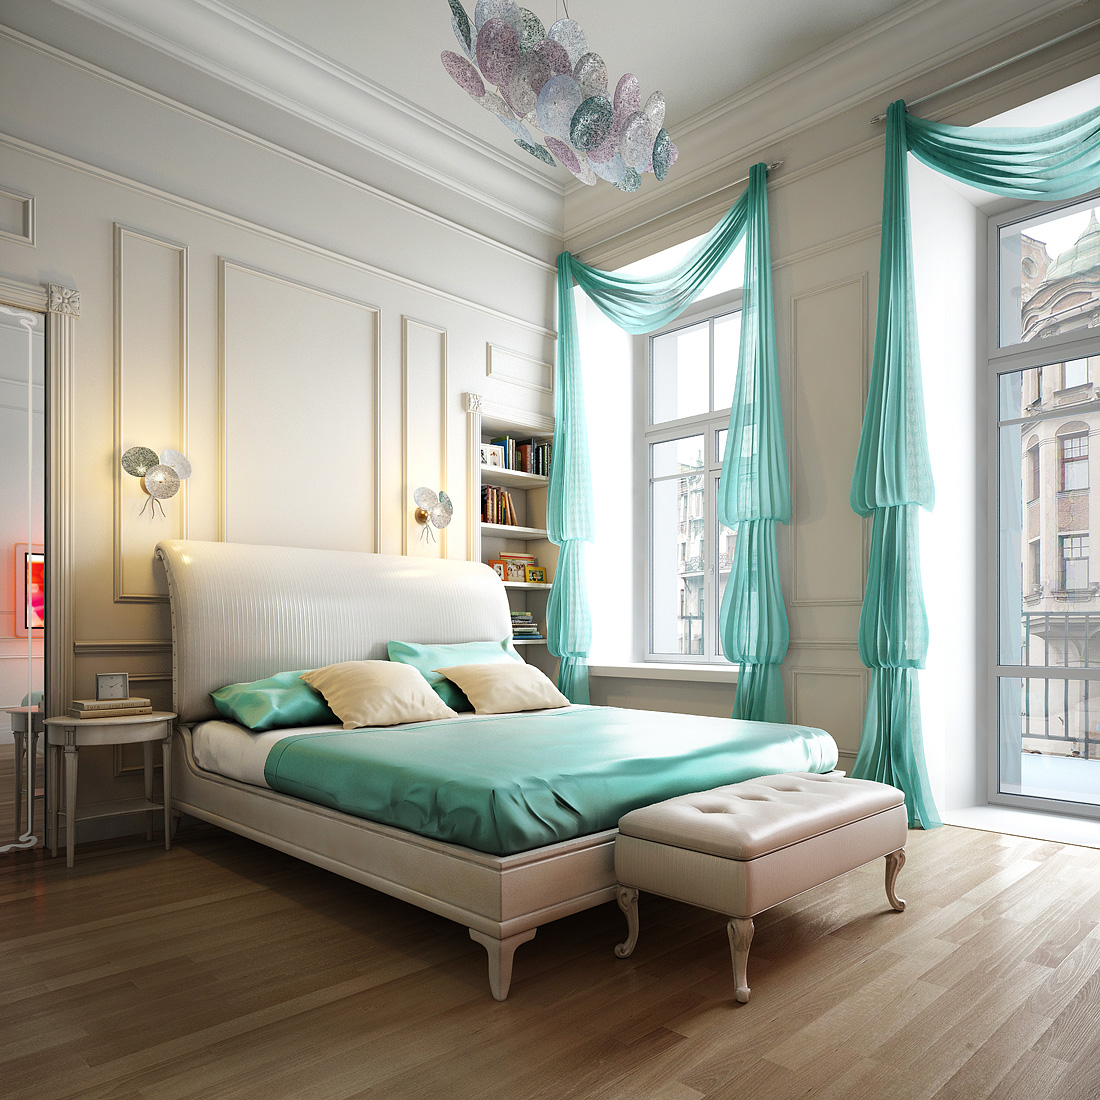 Interior Design Bedroom | Model Home Interior